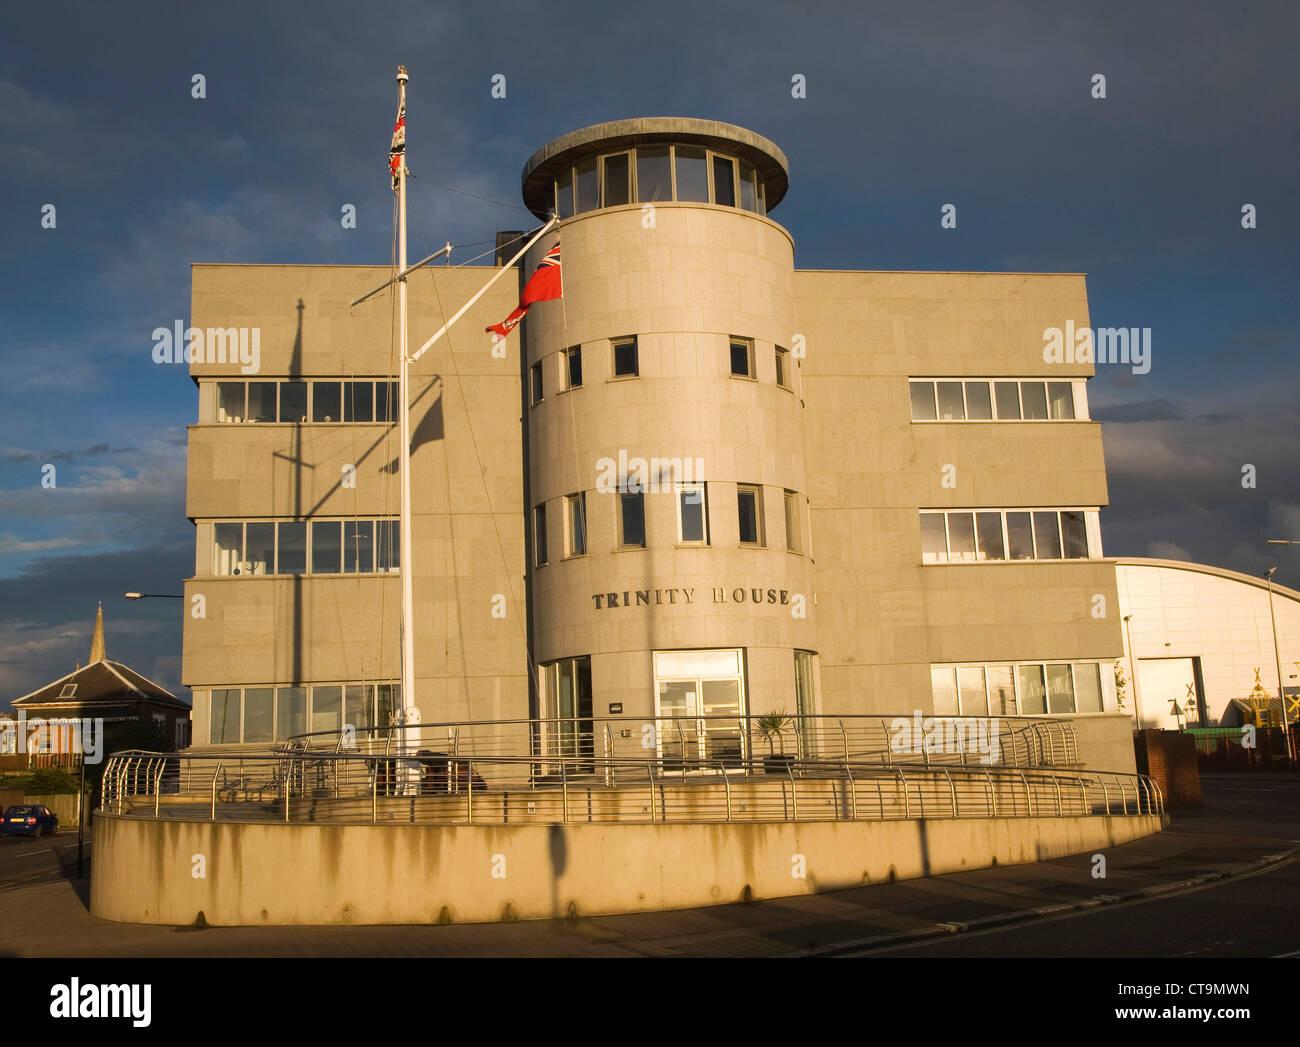 Trinity House building, Harwich, Essex, England - Stock Image